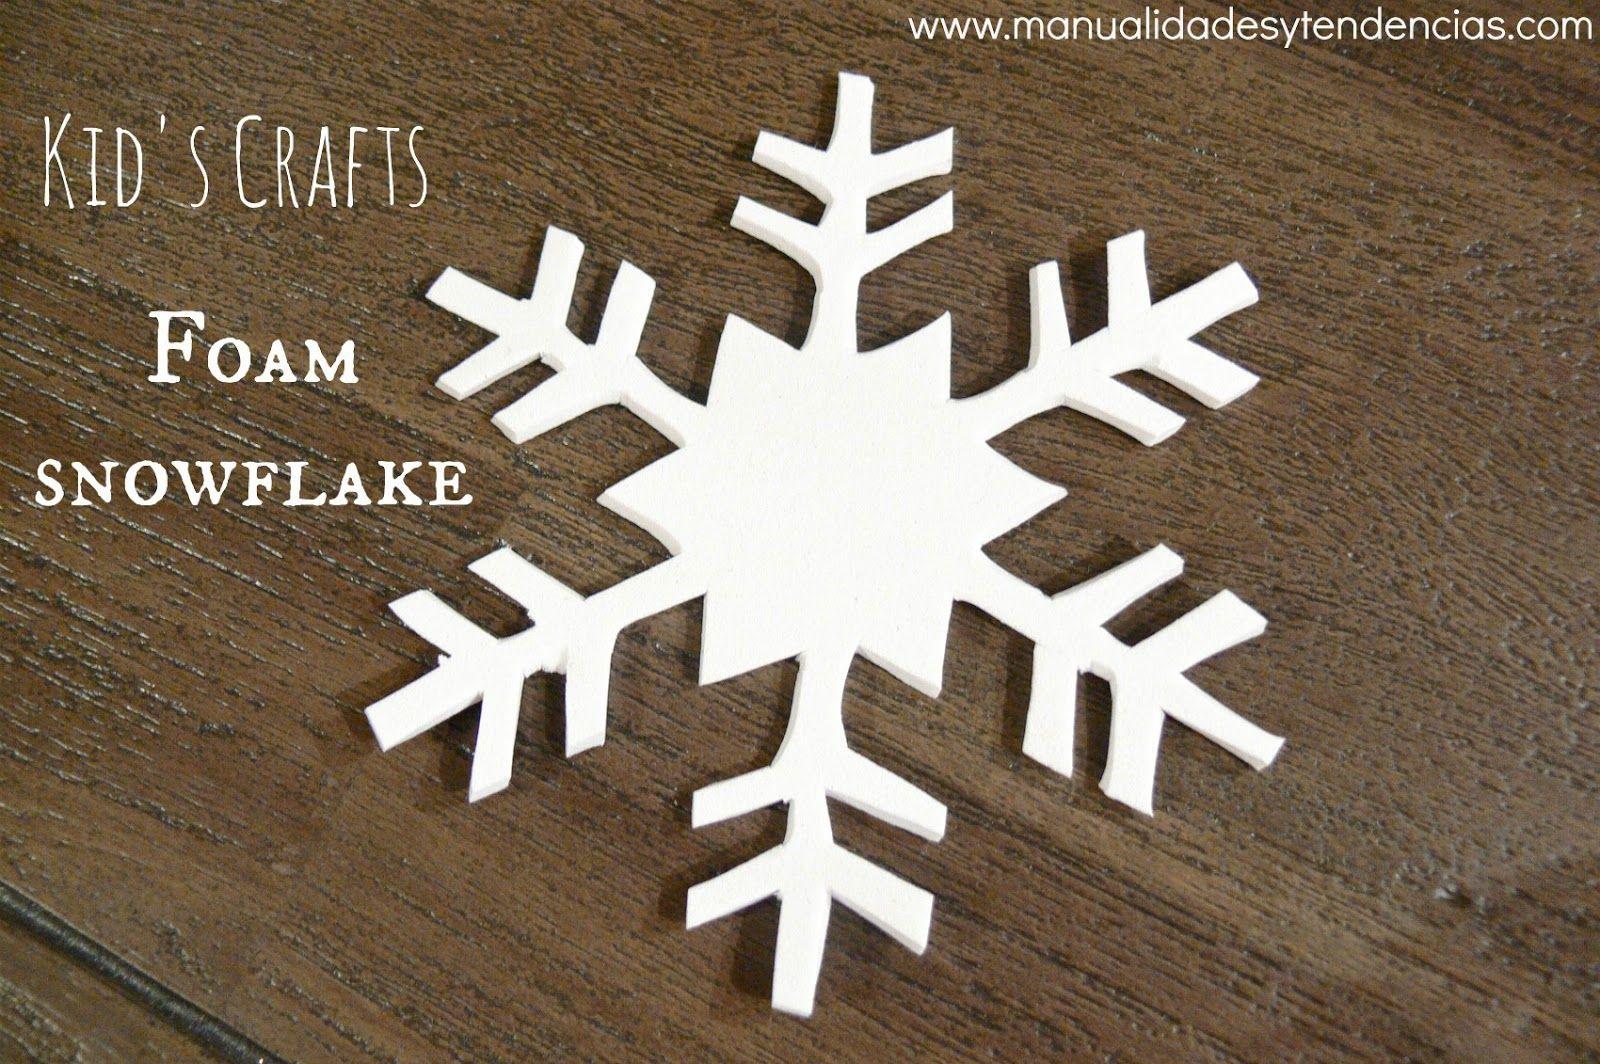 Plantillas navideñas. Foam snowflake | Free Printables | Pinterest ...